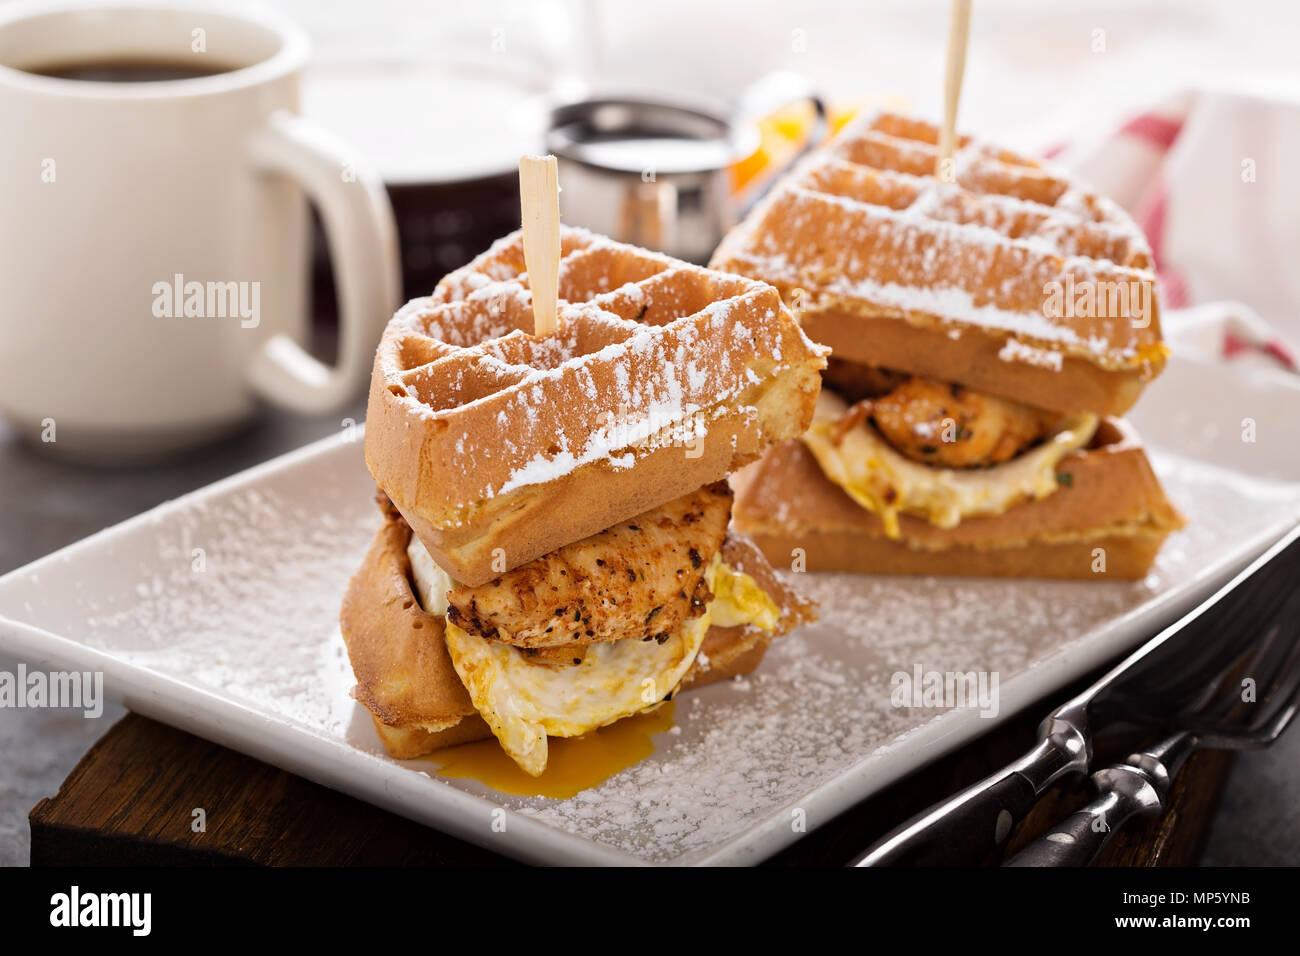 Waffle, fried egg and fish sandwich - Stock Image